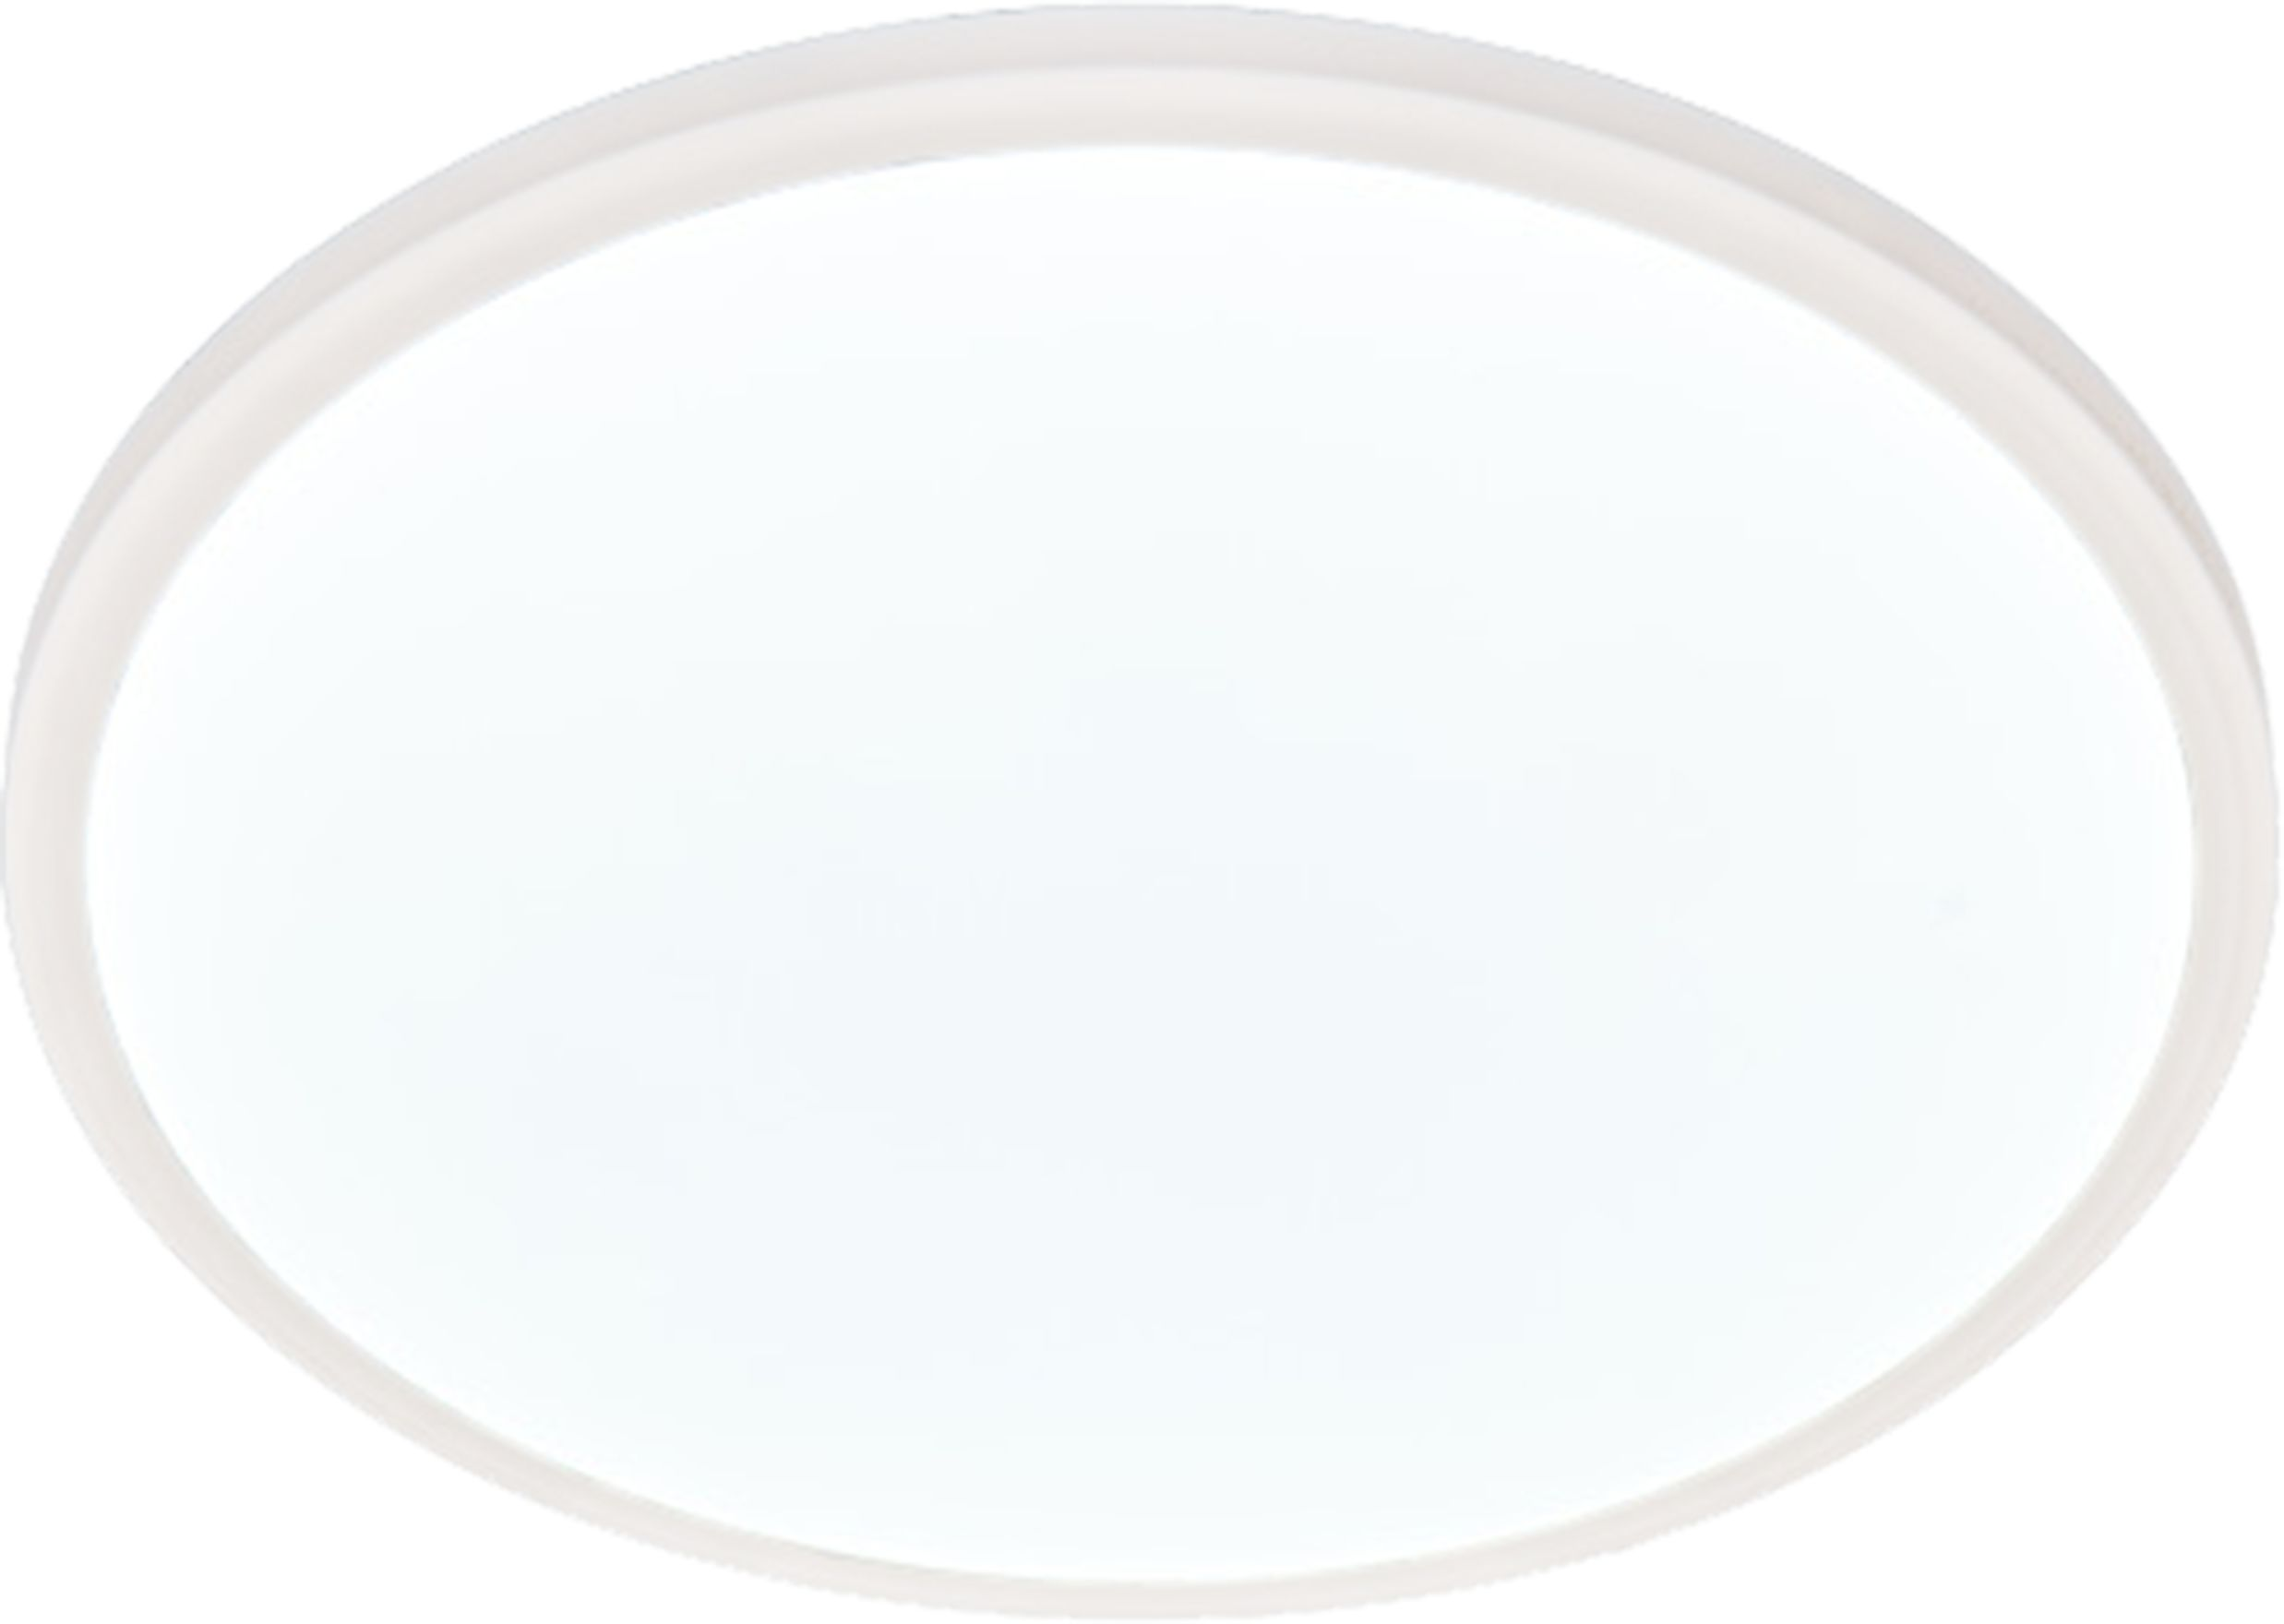 Light Prestige Arctic LP-2511/1C-32 WH plafon lampa sufitowa biały 4000K 1x24W LED IP54 32cm